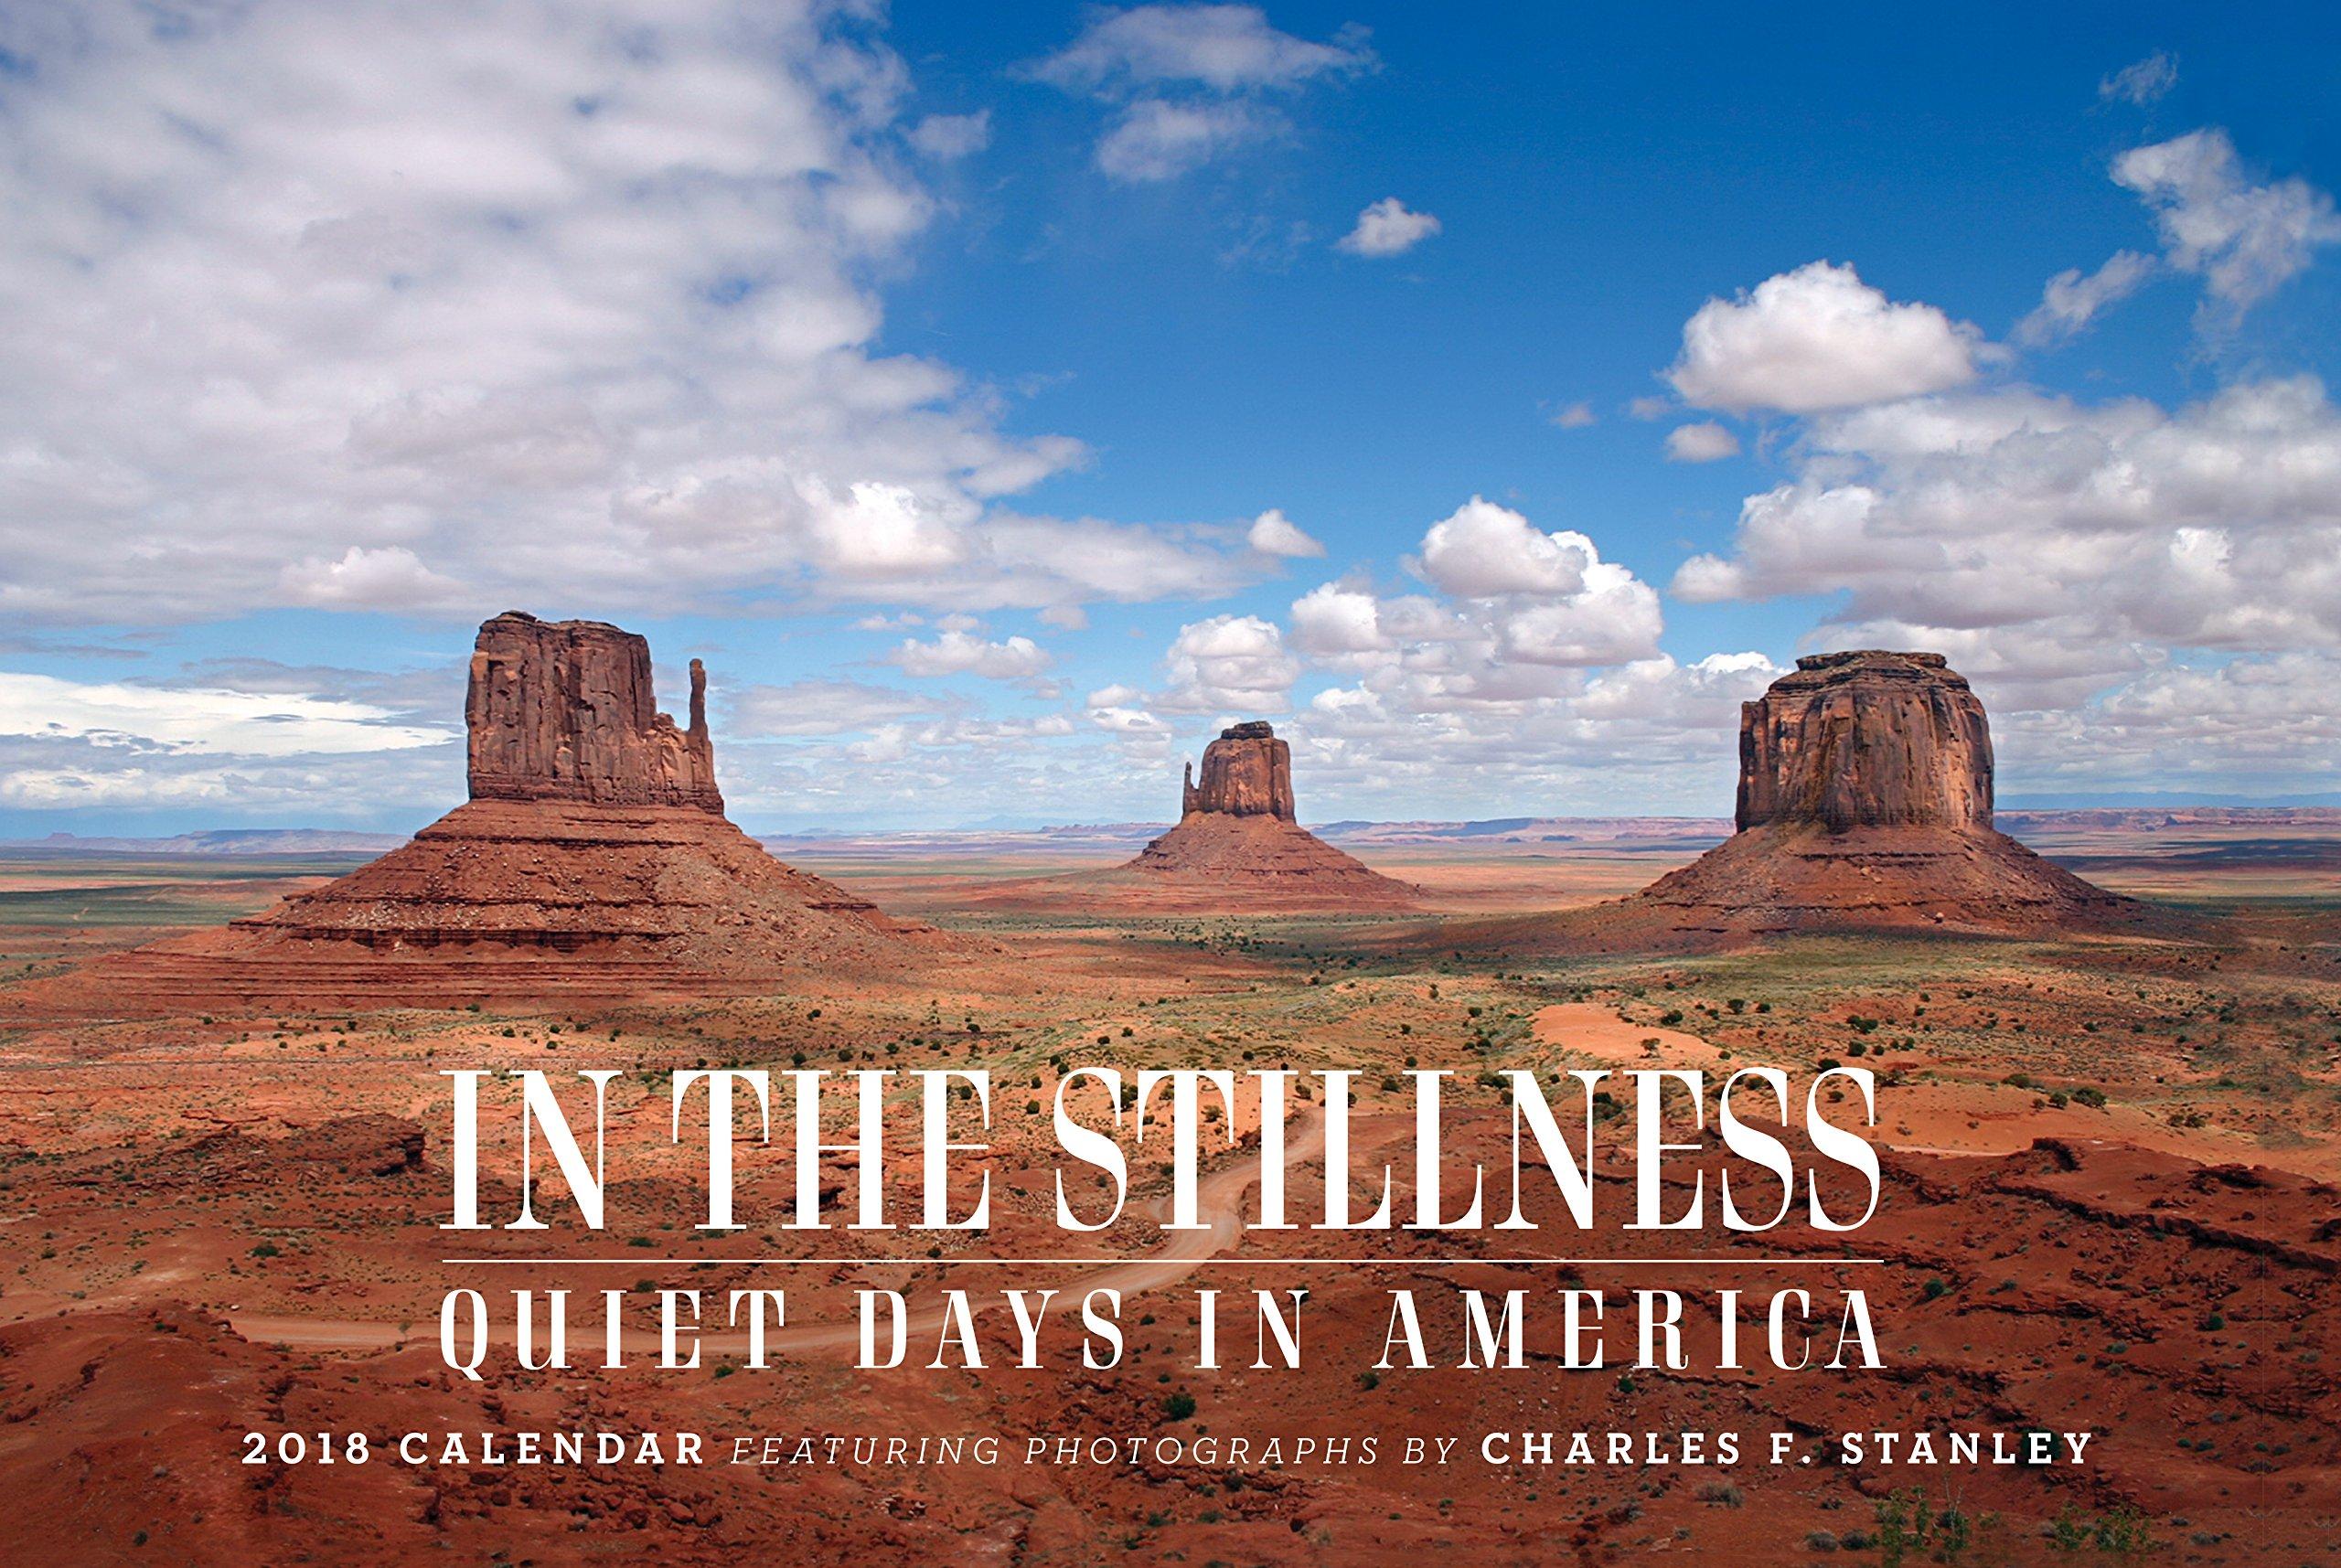 Download 2018 Wall Calendar - In the Stillness: Quiet Days in America ebook